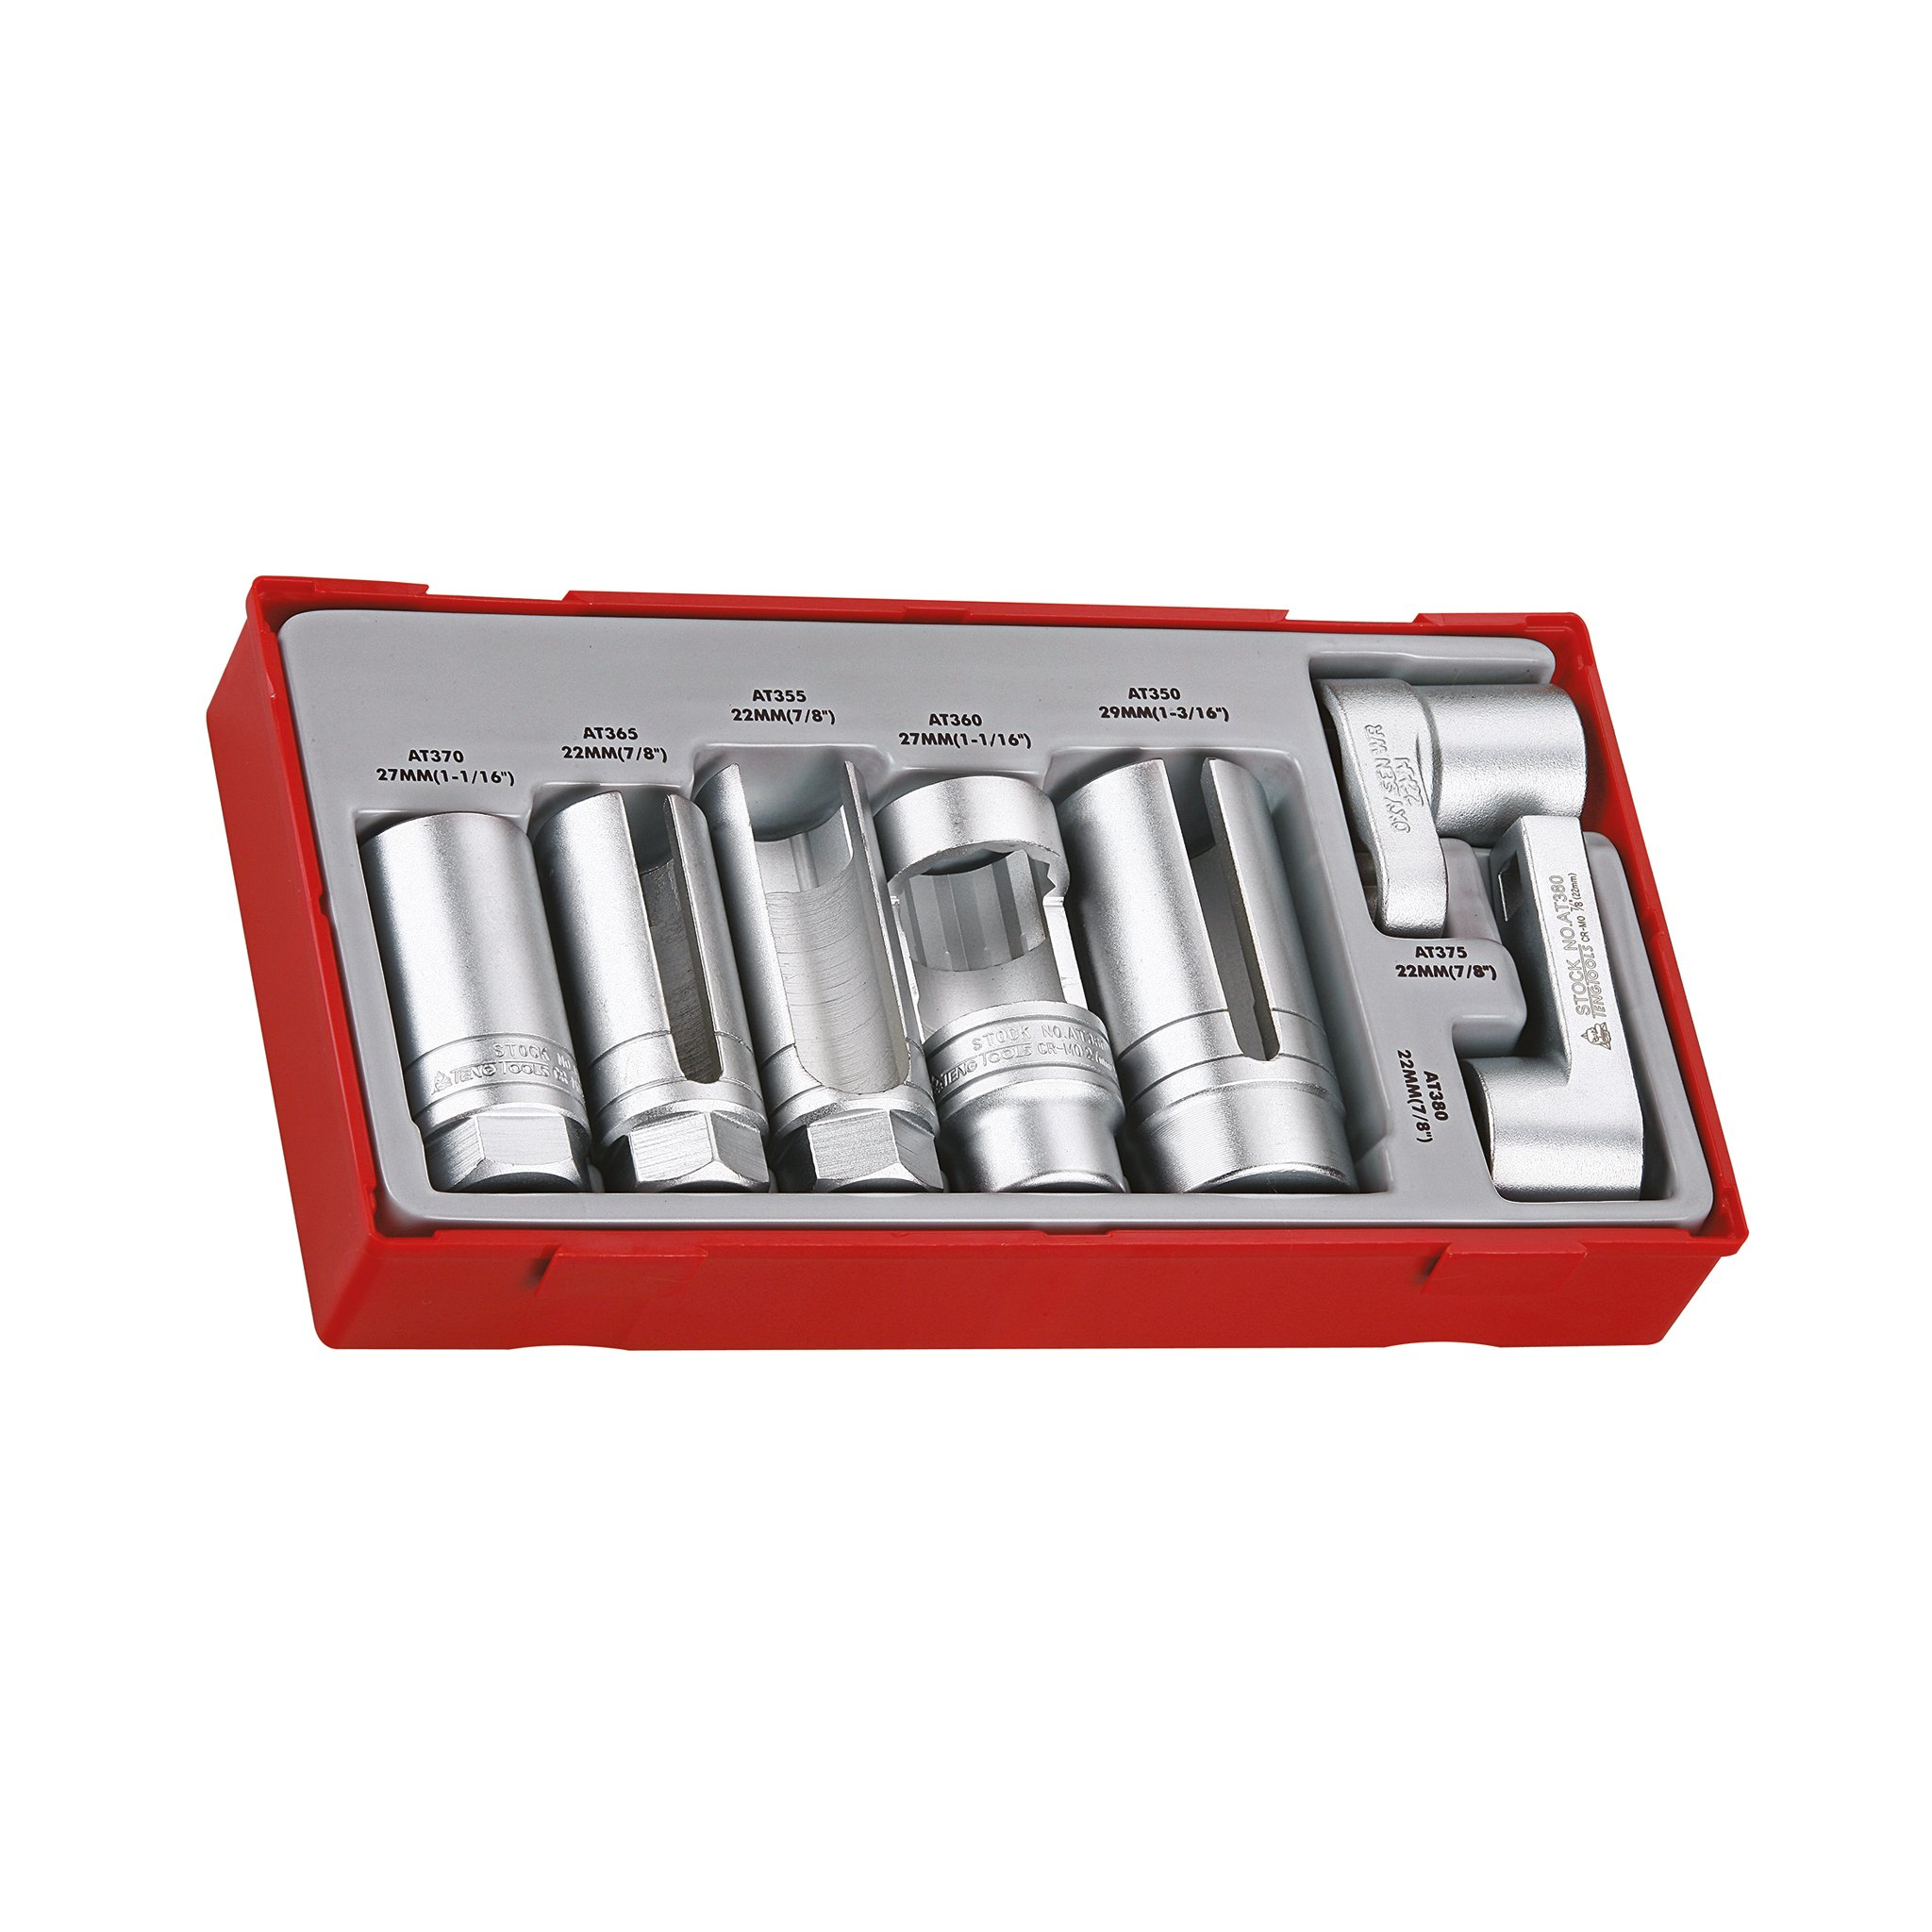 Teng Tools - 7 Piece Automotive Specialist Socket Set - TTSS07 by Teng Tools (Image #1)